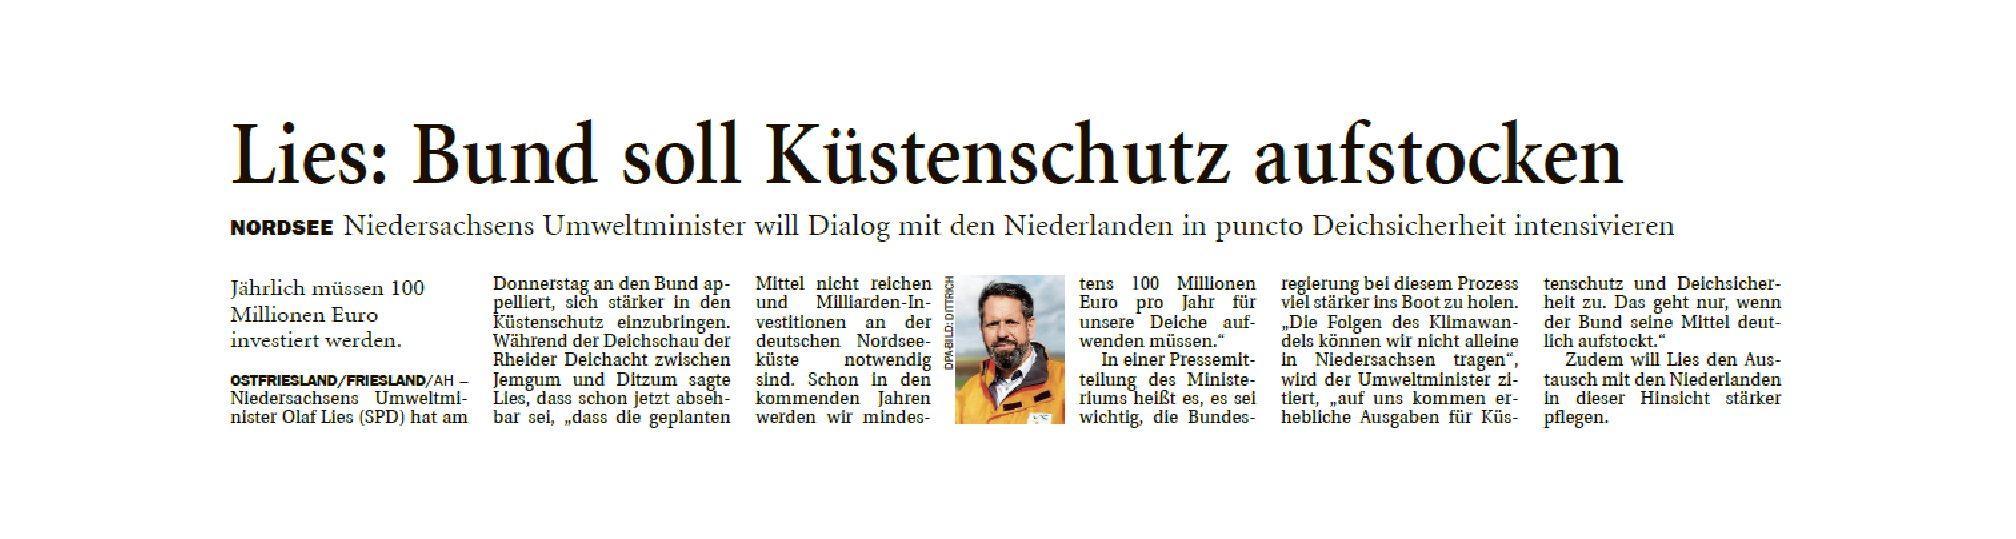 Jeversches Wochenblatt 12.10.2019 III